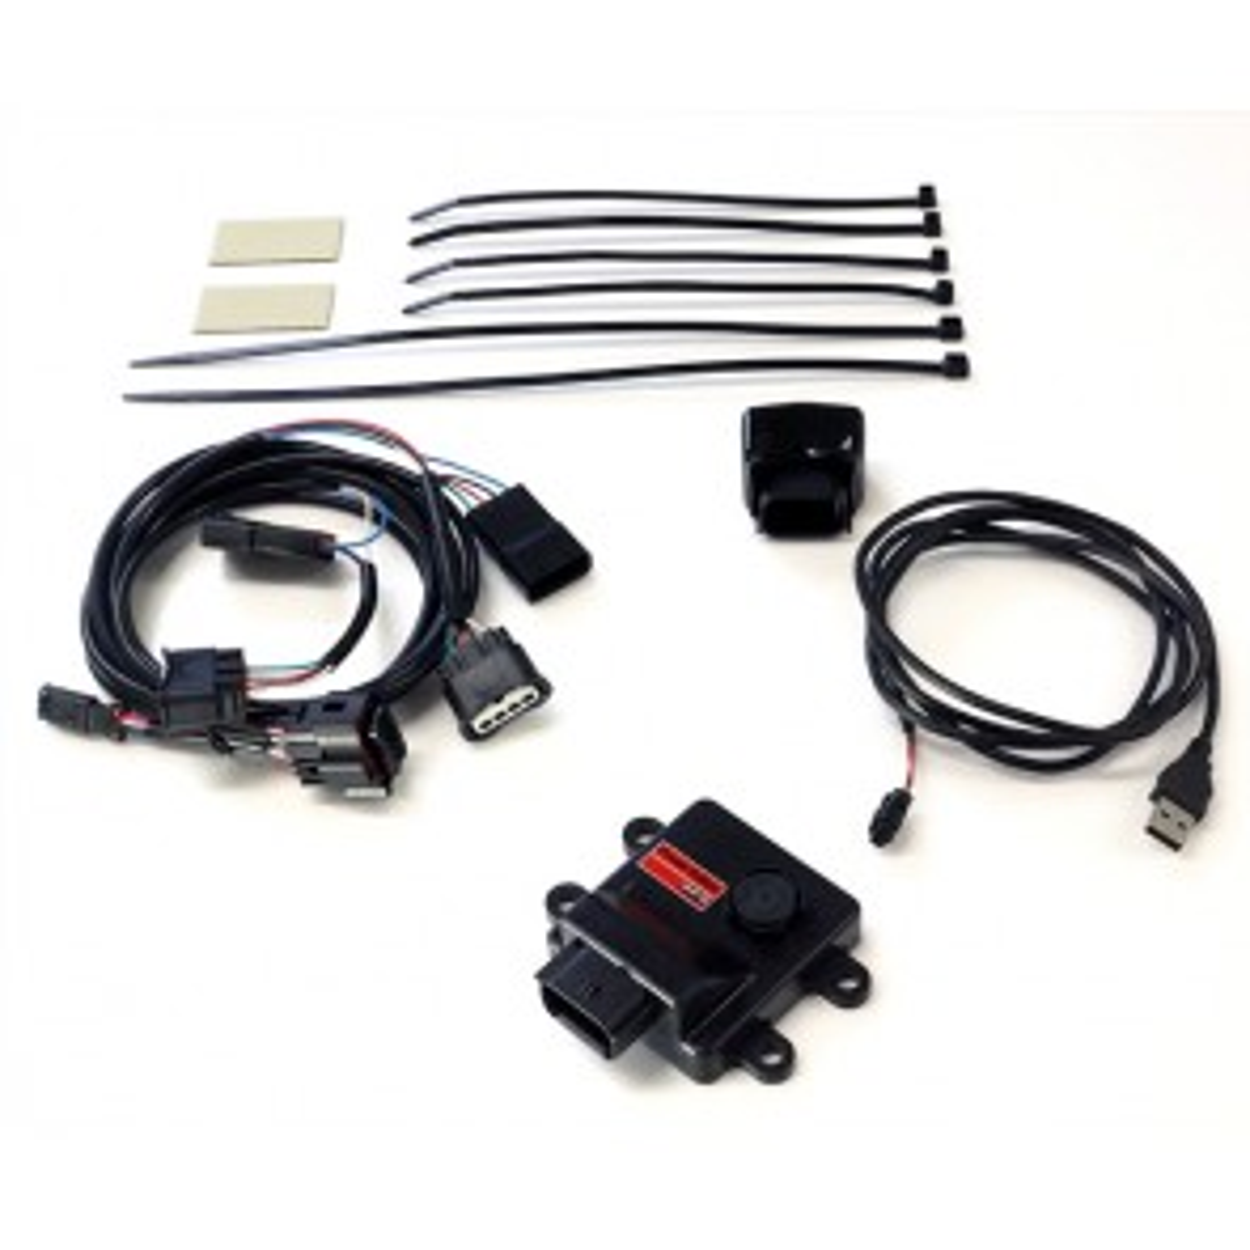 HKS Power Editor GR For Toyota Yaris (GXPA16)